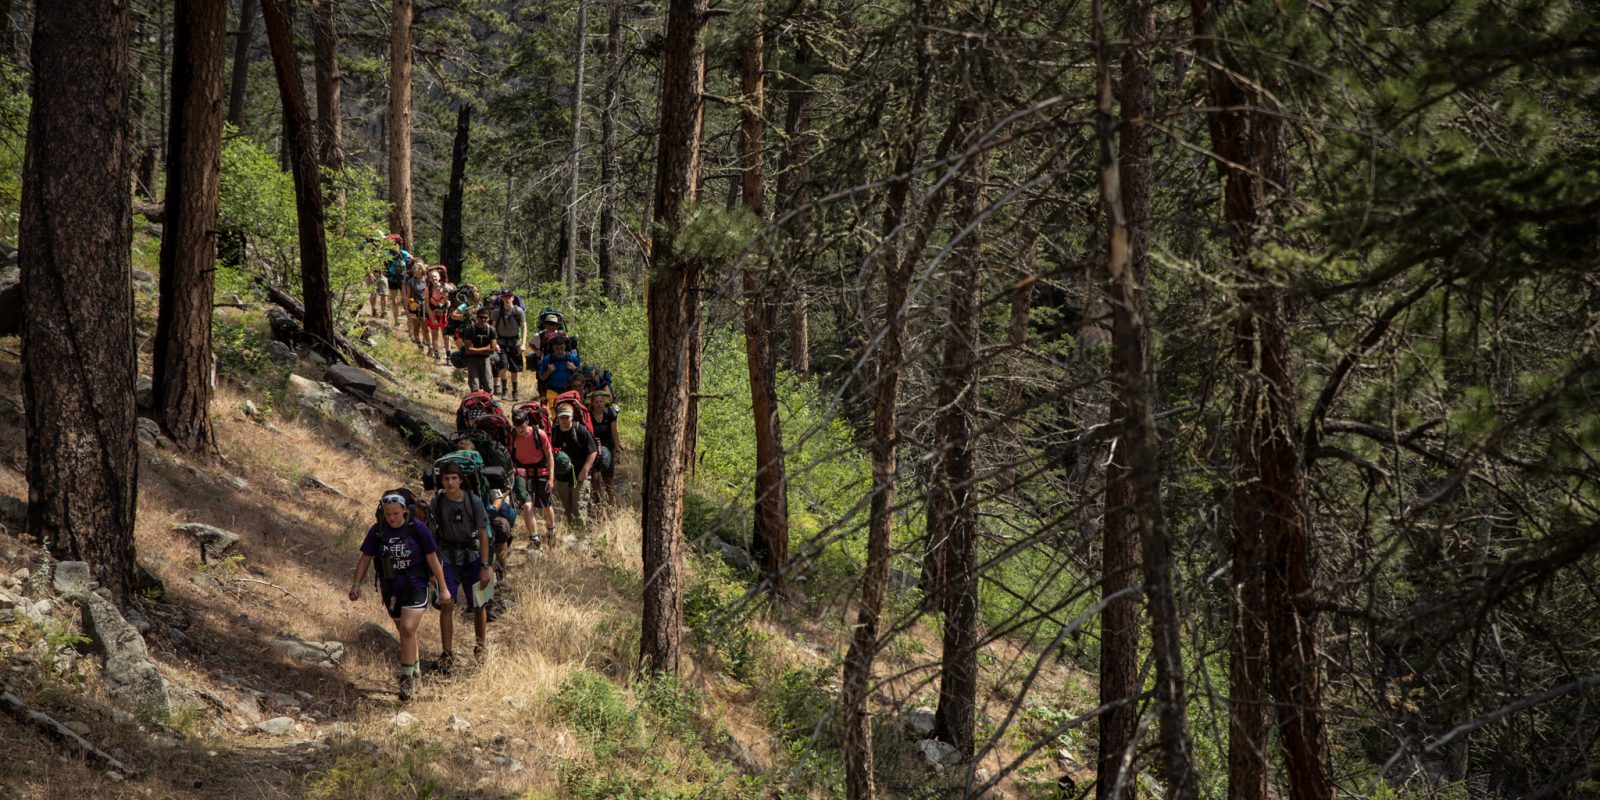 leadertreks georgia backpacking adventure